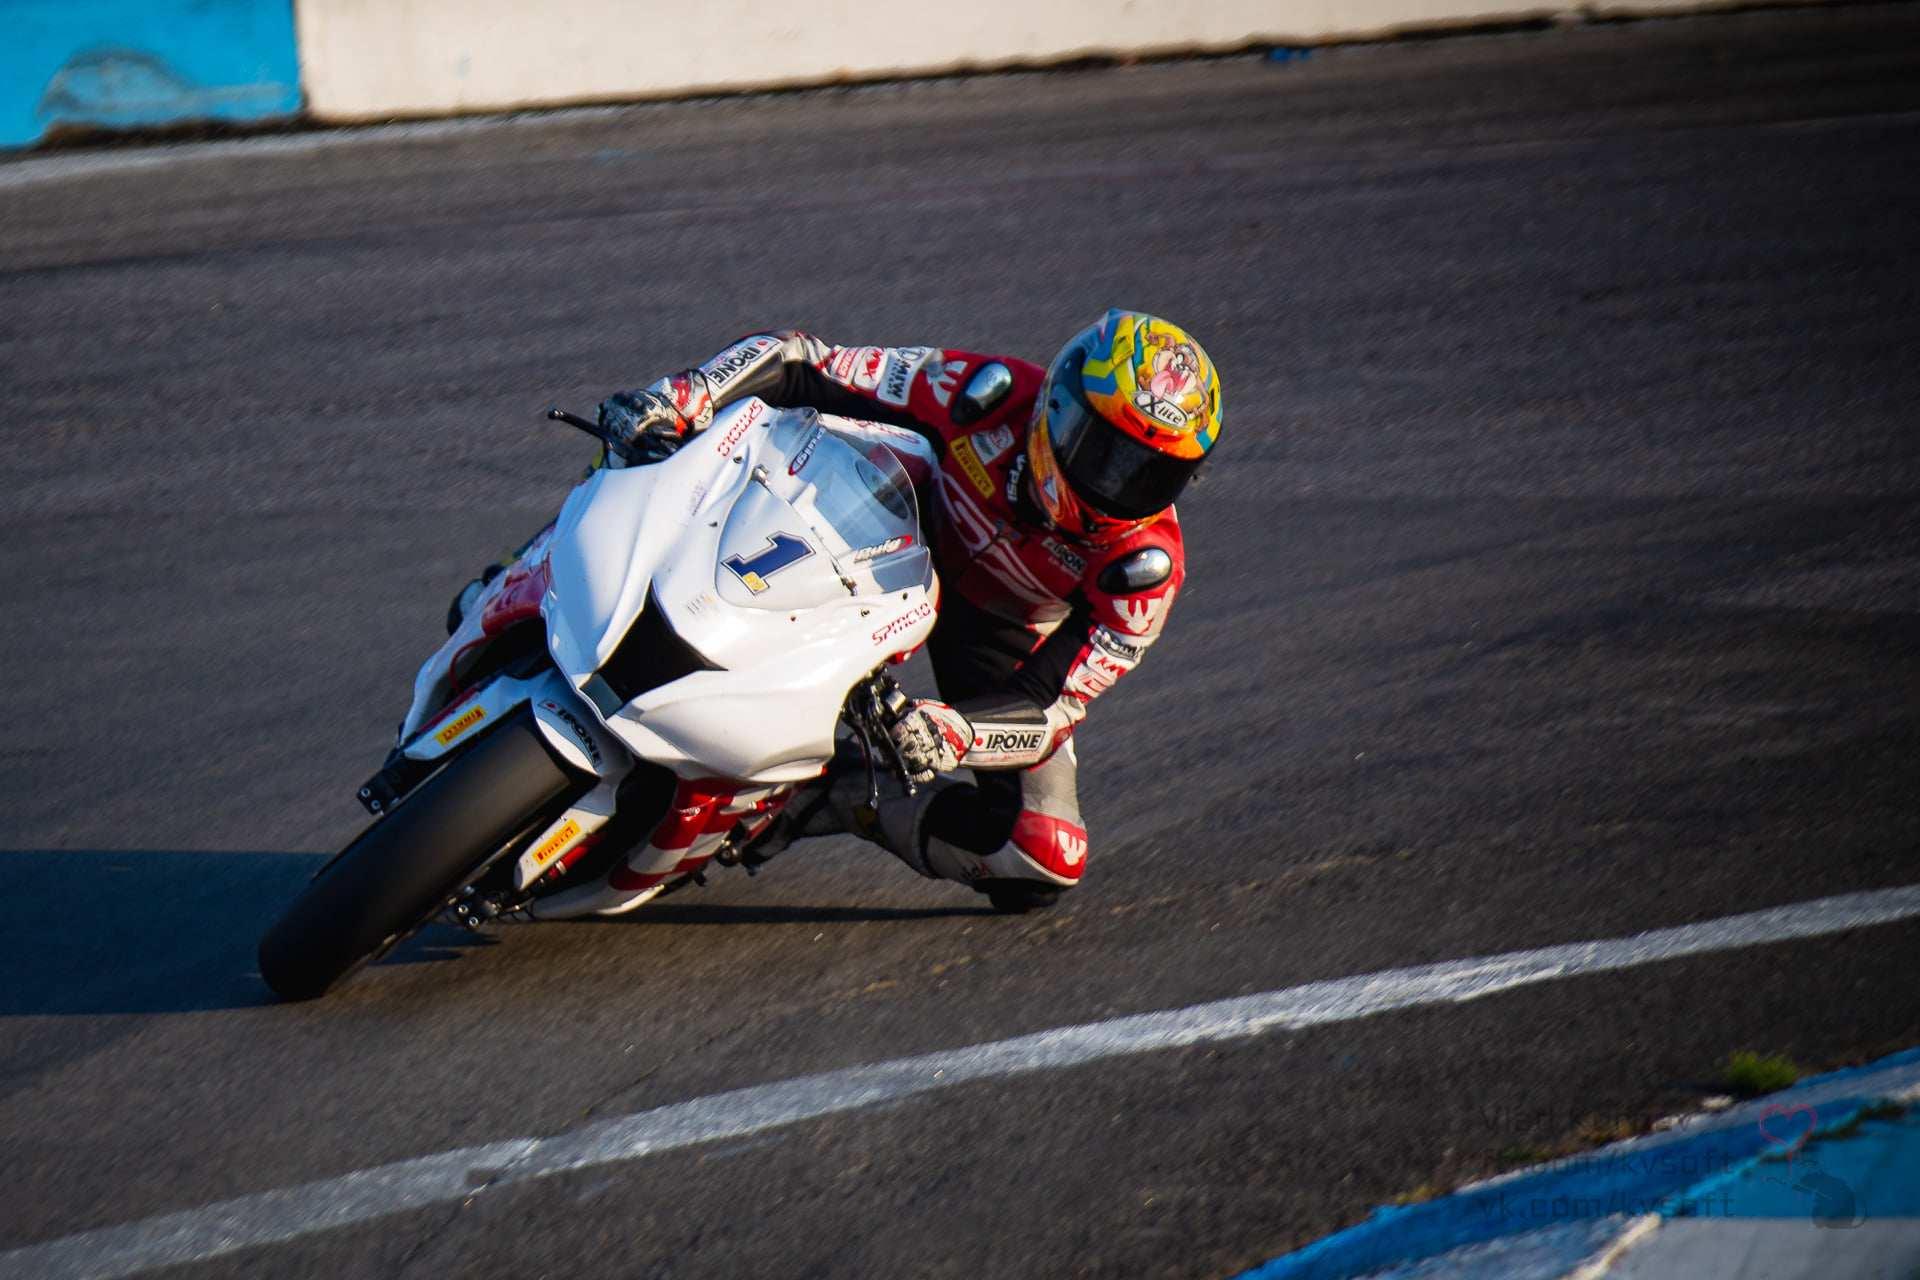 5-6_etap_MotoGPUkraine_029